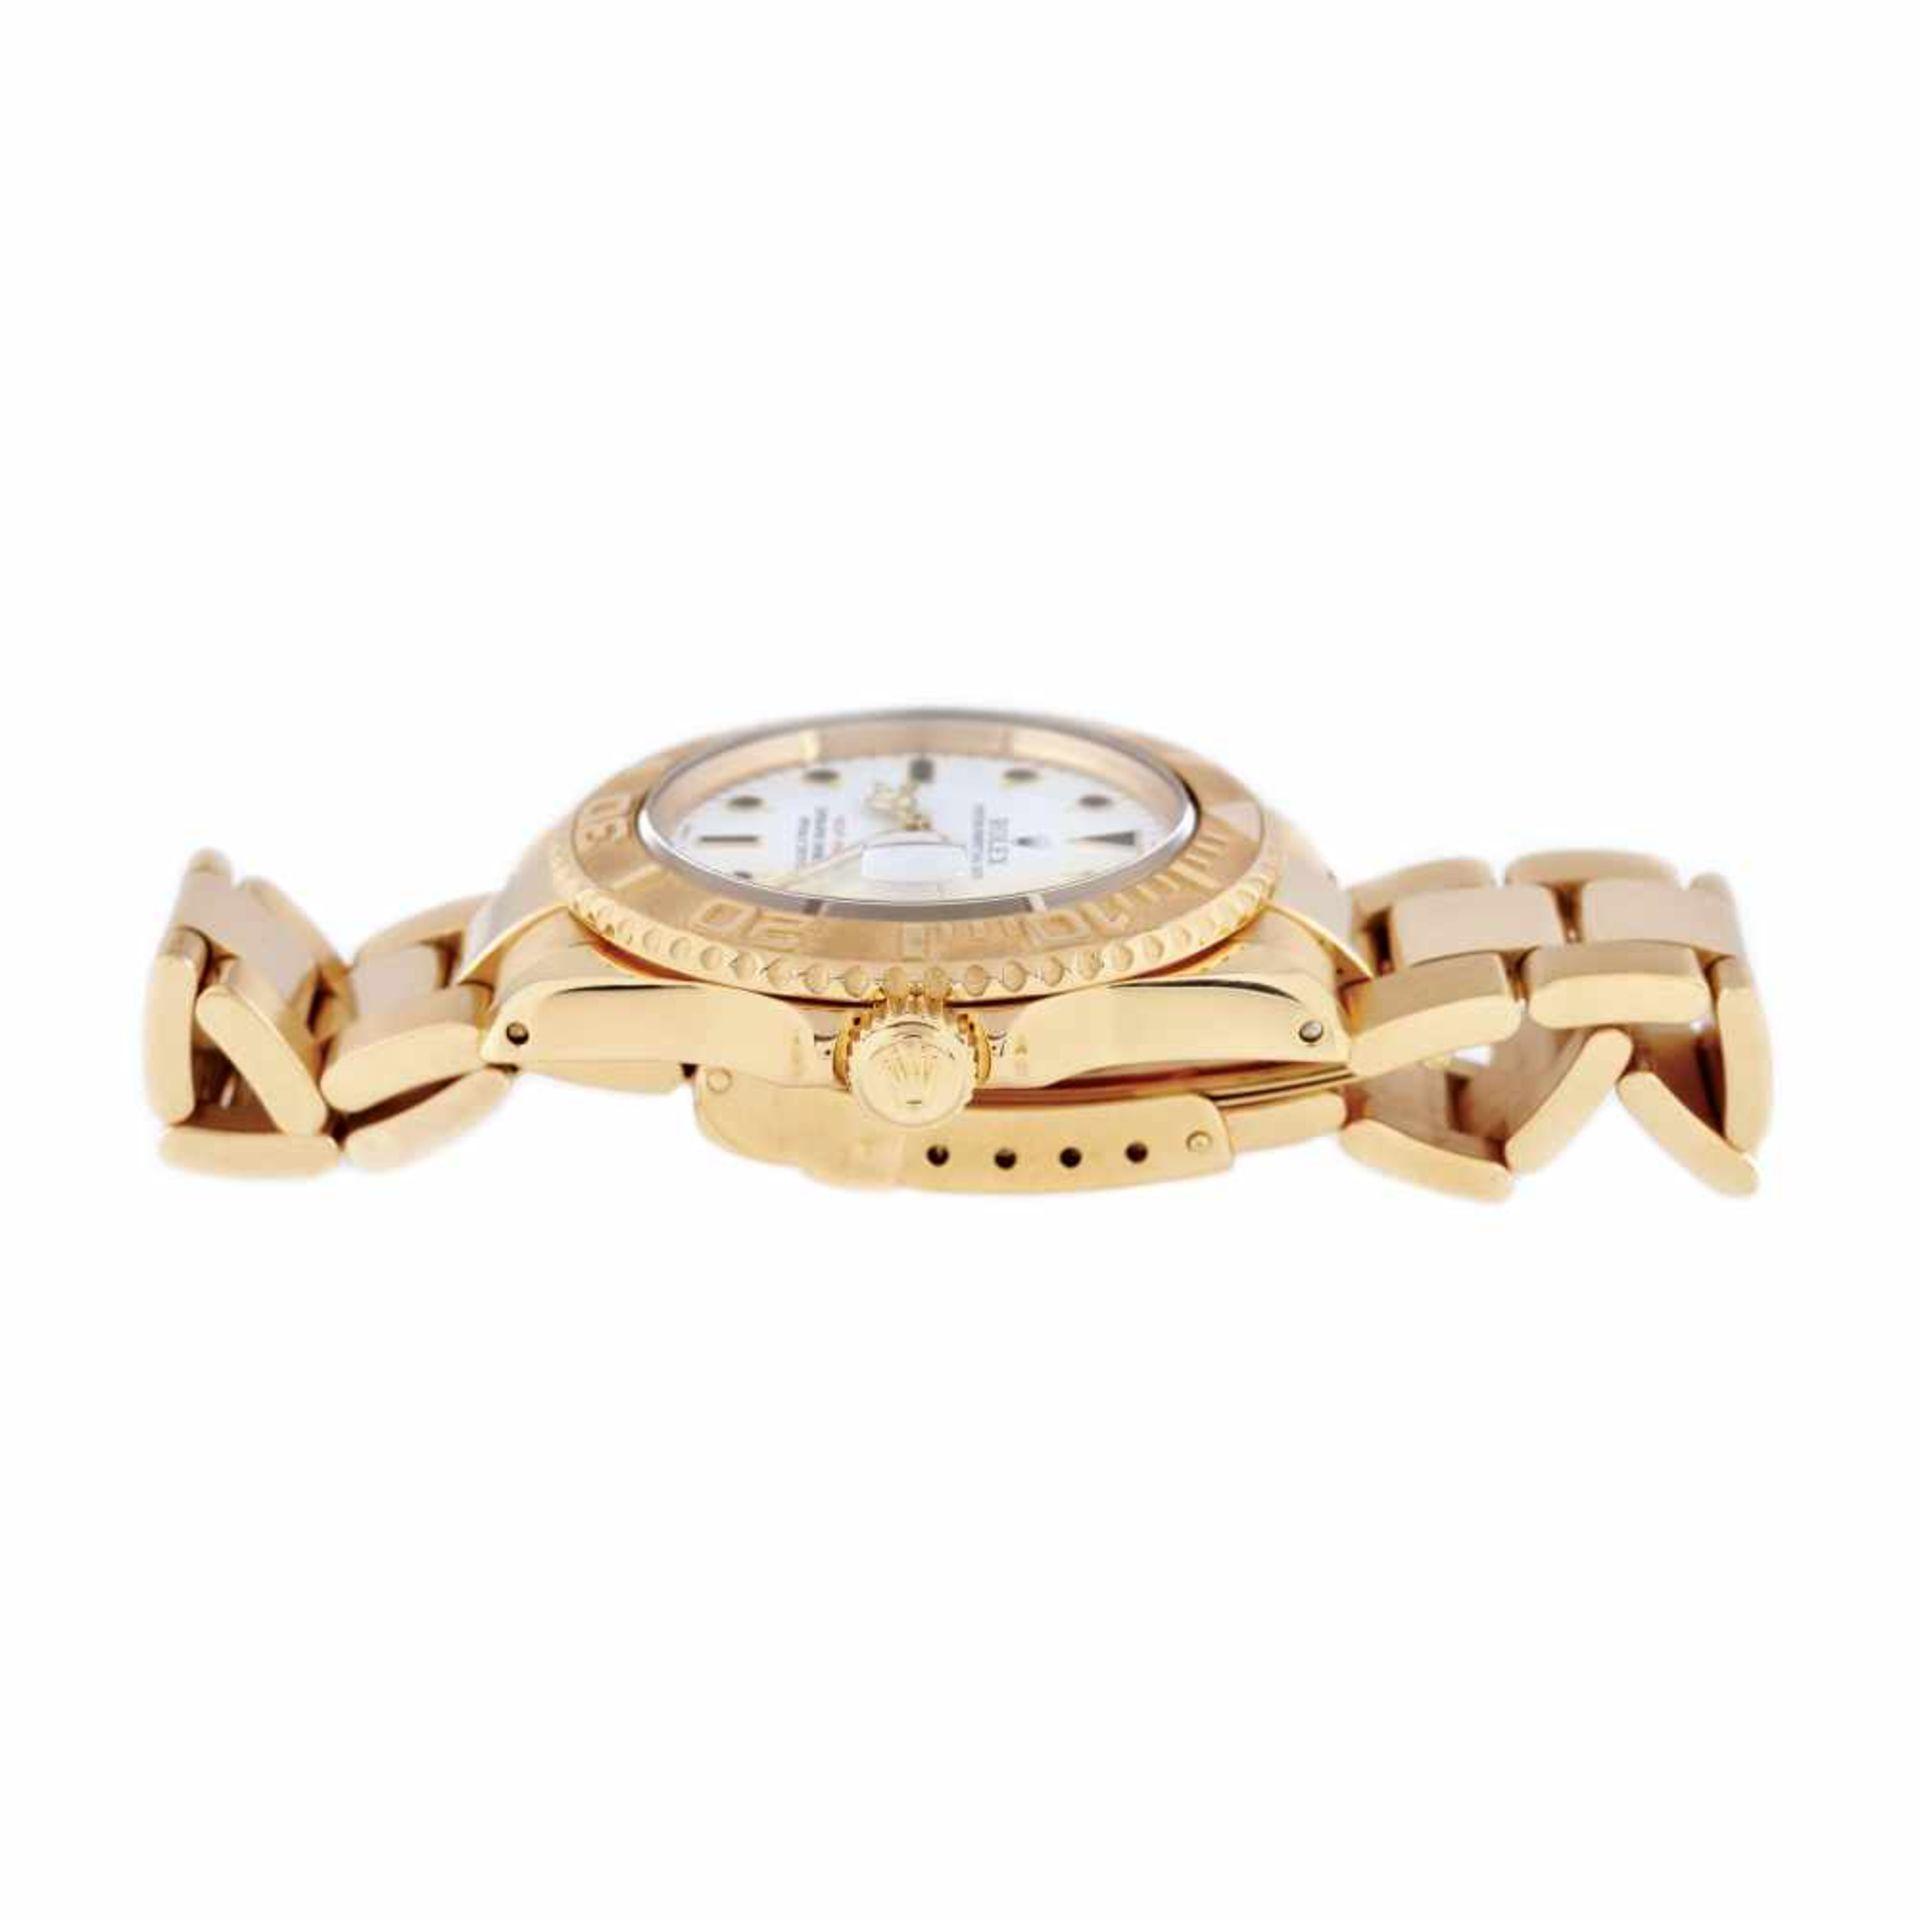 Rolex Yacht Master wristwatch, gold, men, instruction manual and original box - Bild 5 aus 6